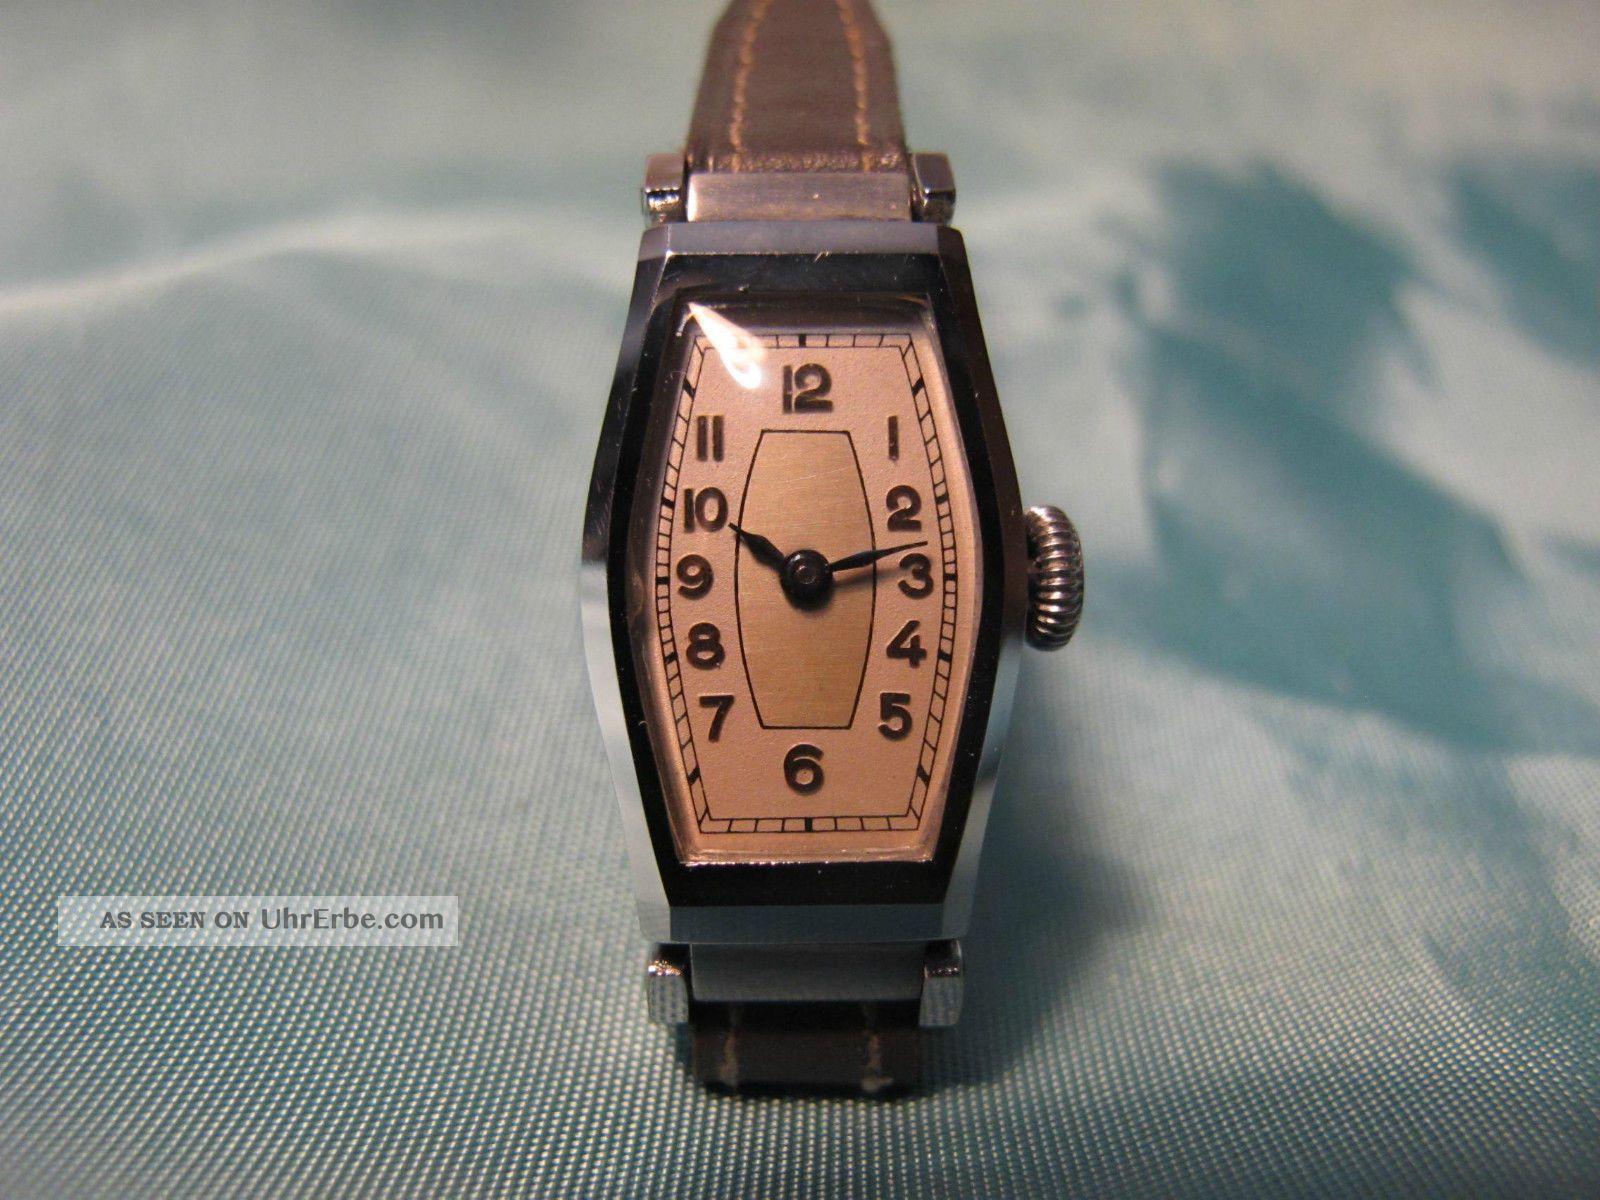 Damen - Armbanduhr Marke